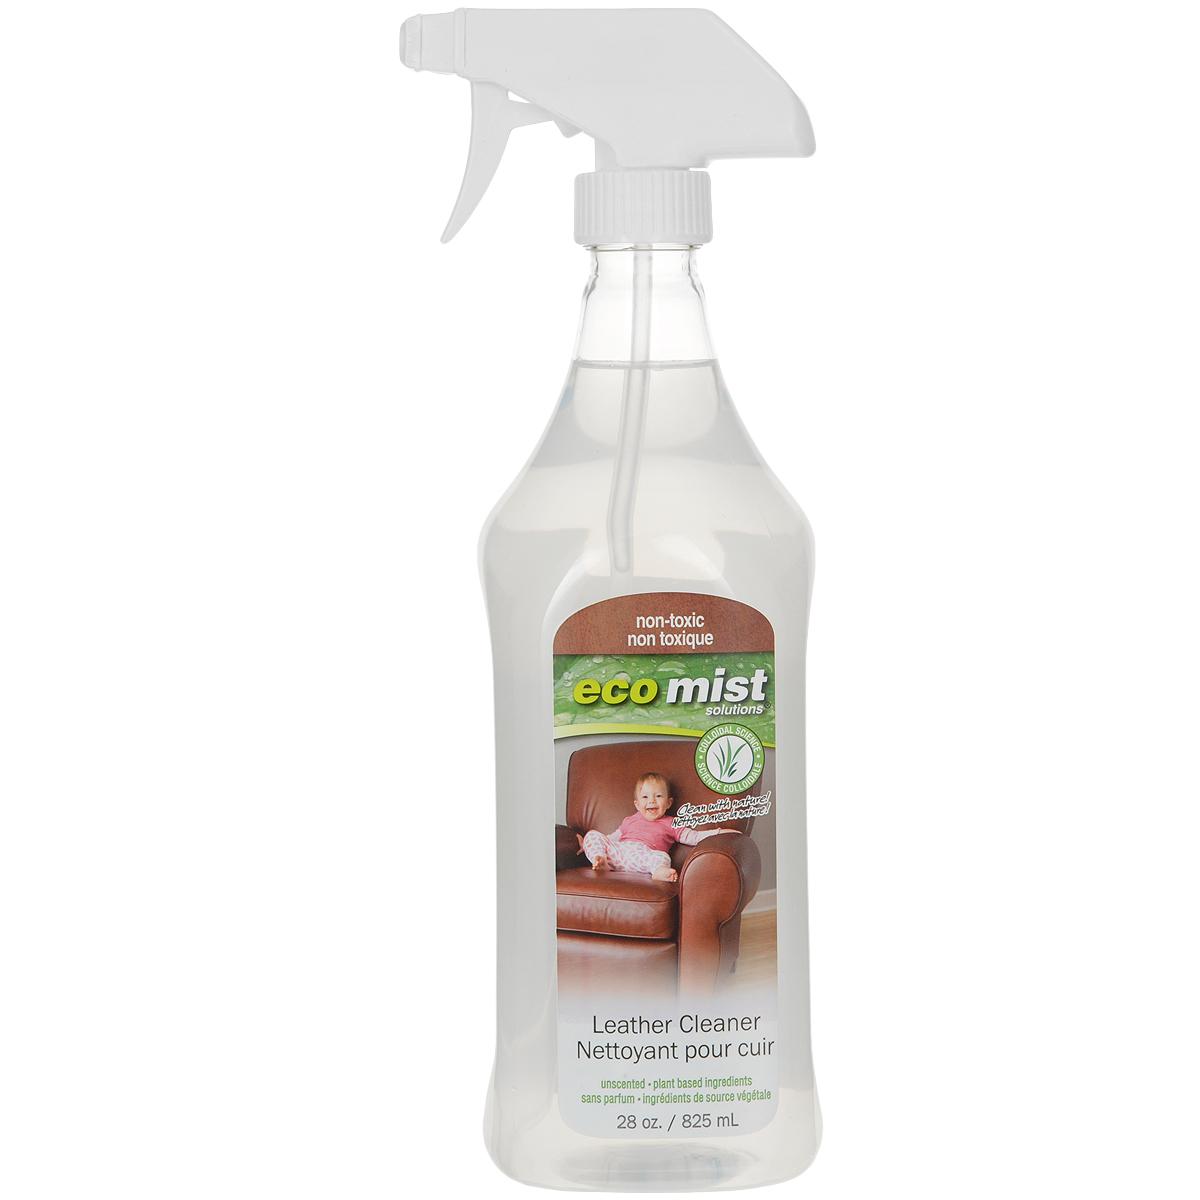 Средство для чистки натуральной кожи Eco Mist, 825 мл средство для удаления жира eco mist 825 мл